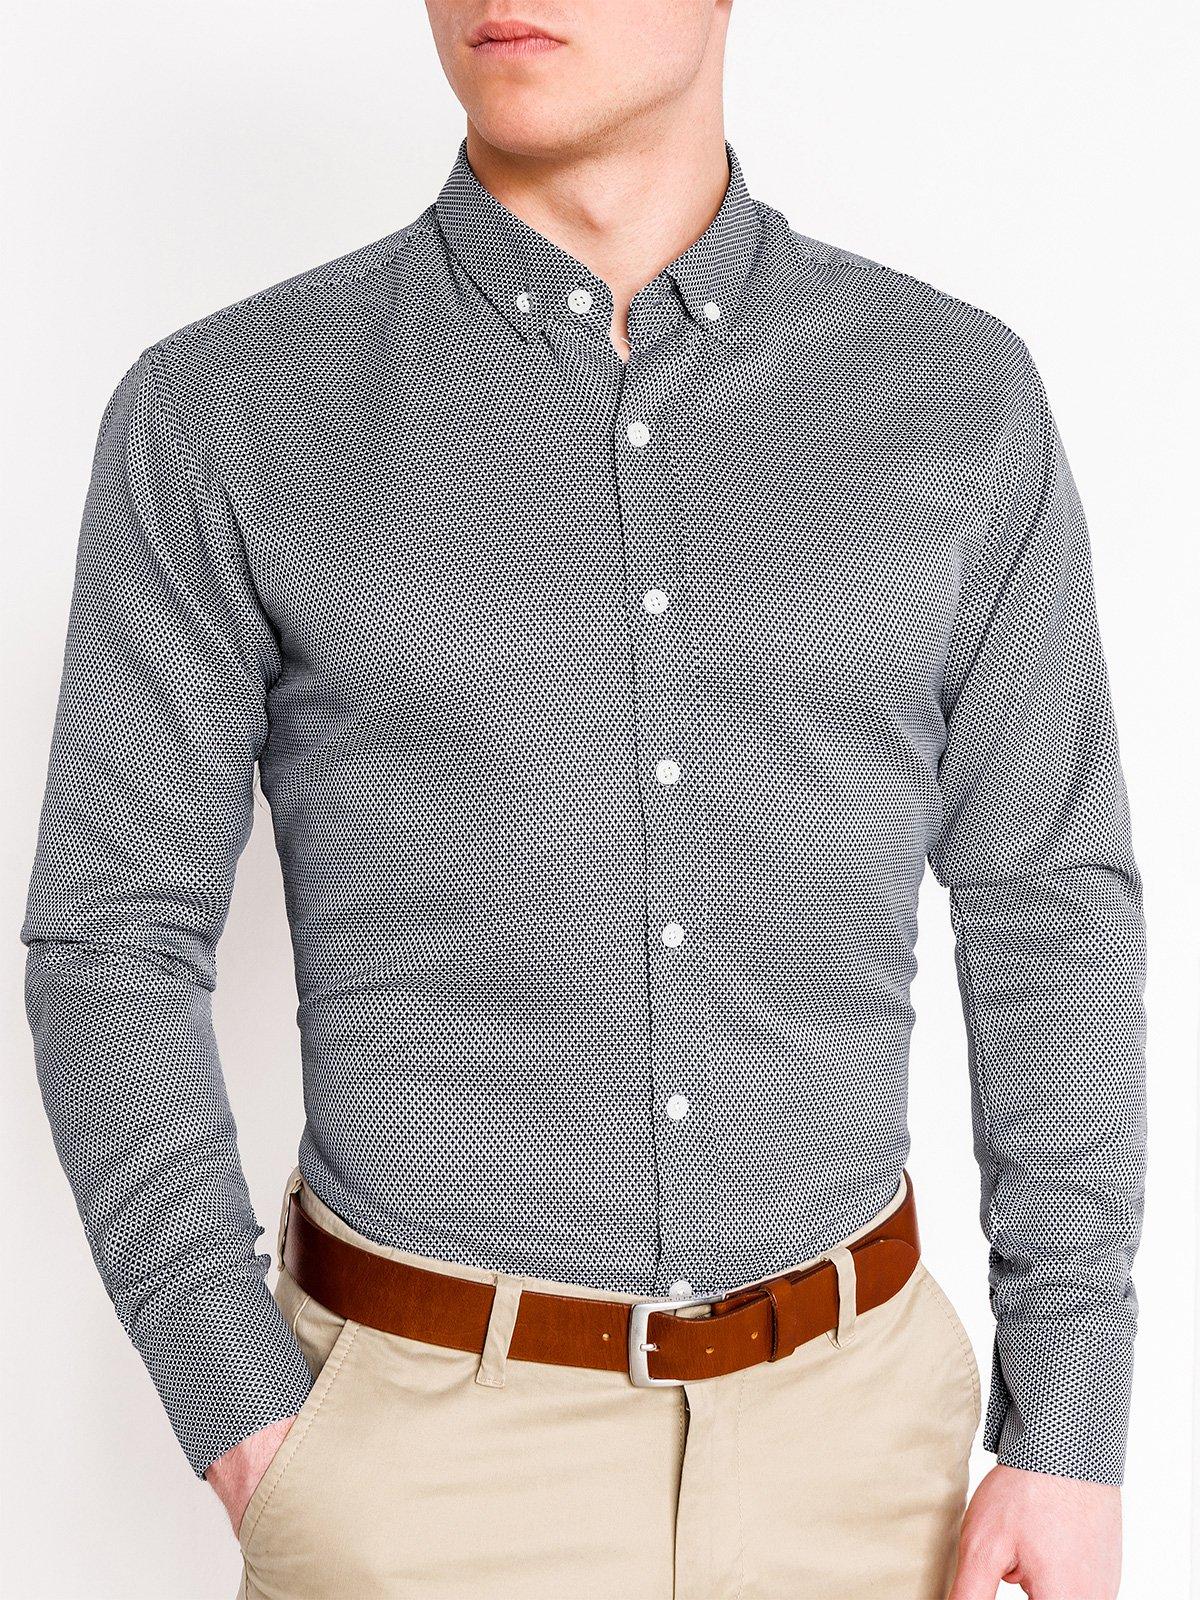 9d473ab06 Koszula męska elegancka z długim rękawem K401 - czarna - Sklep Ombre